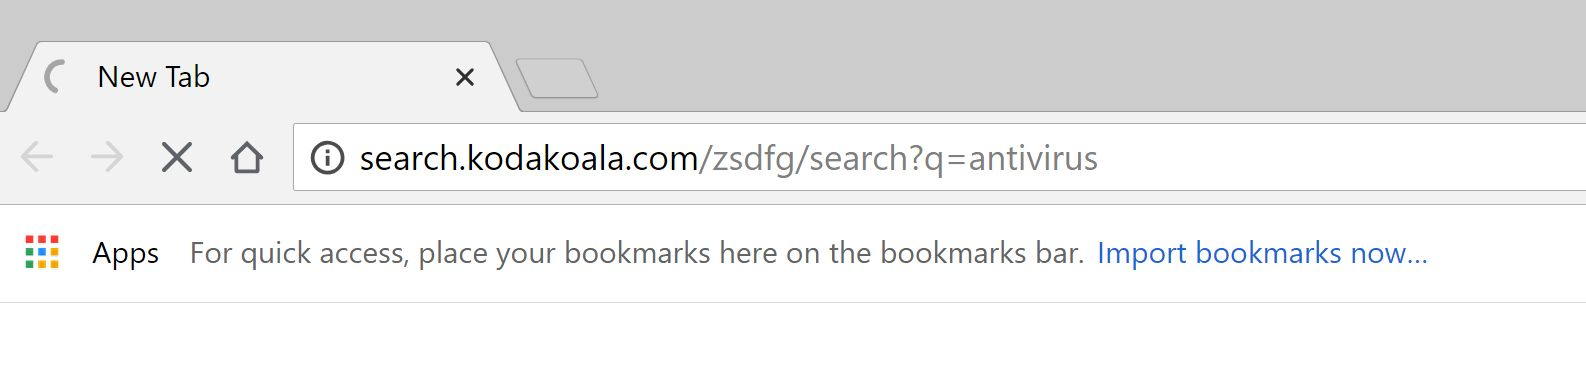 Search.kodakoala.com Redirect Virus